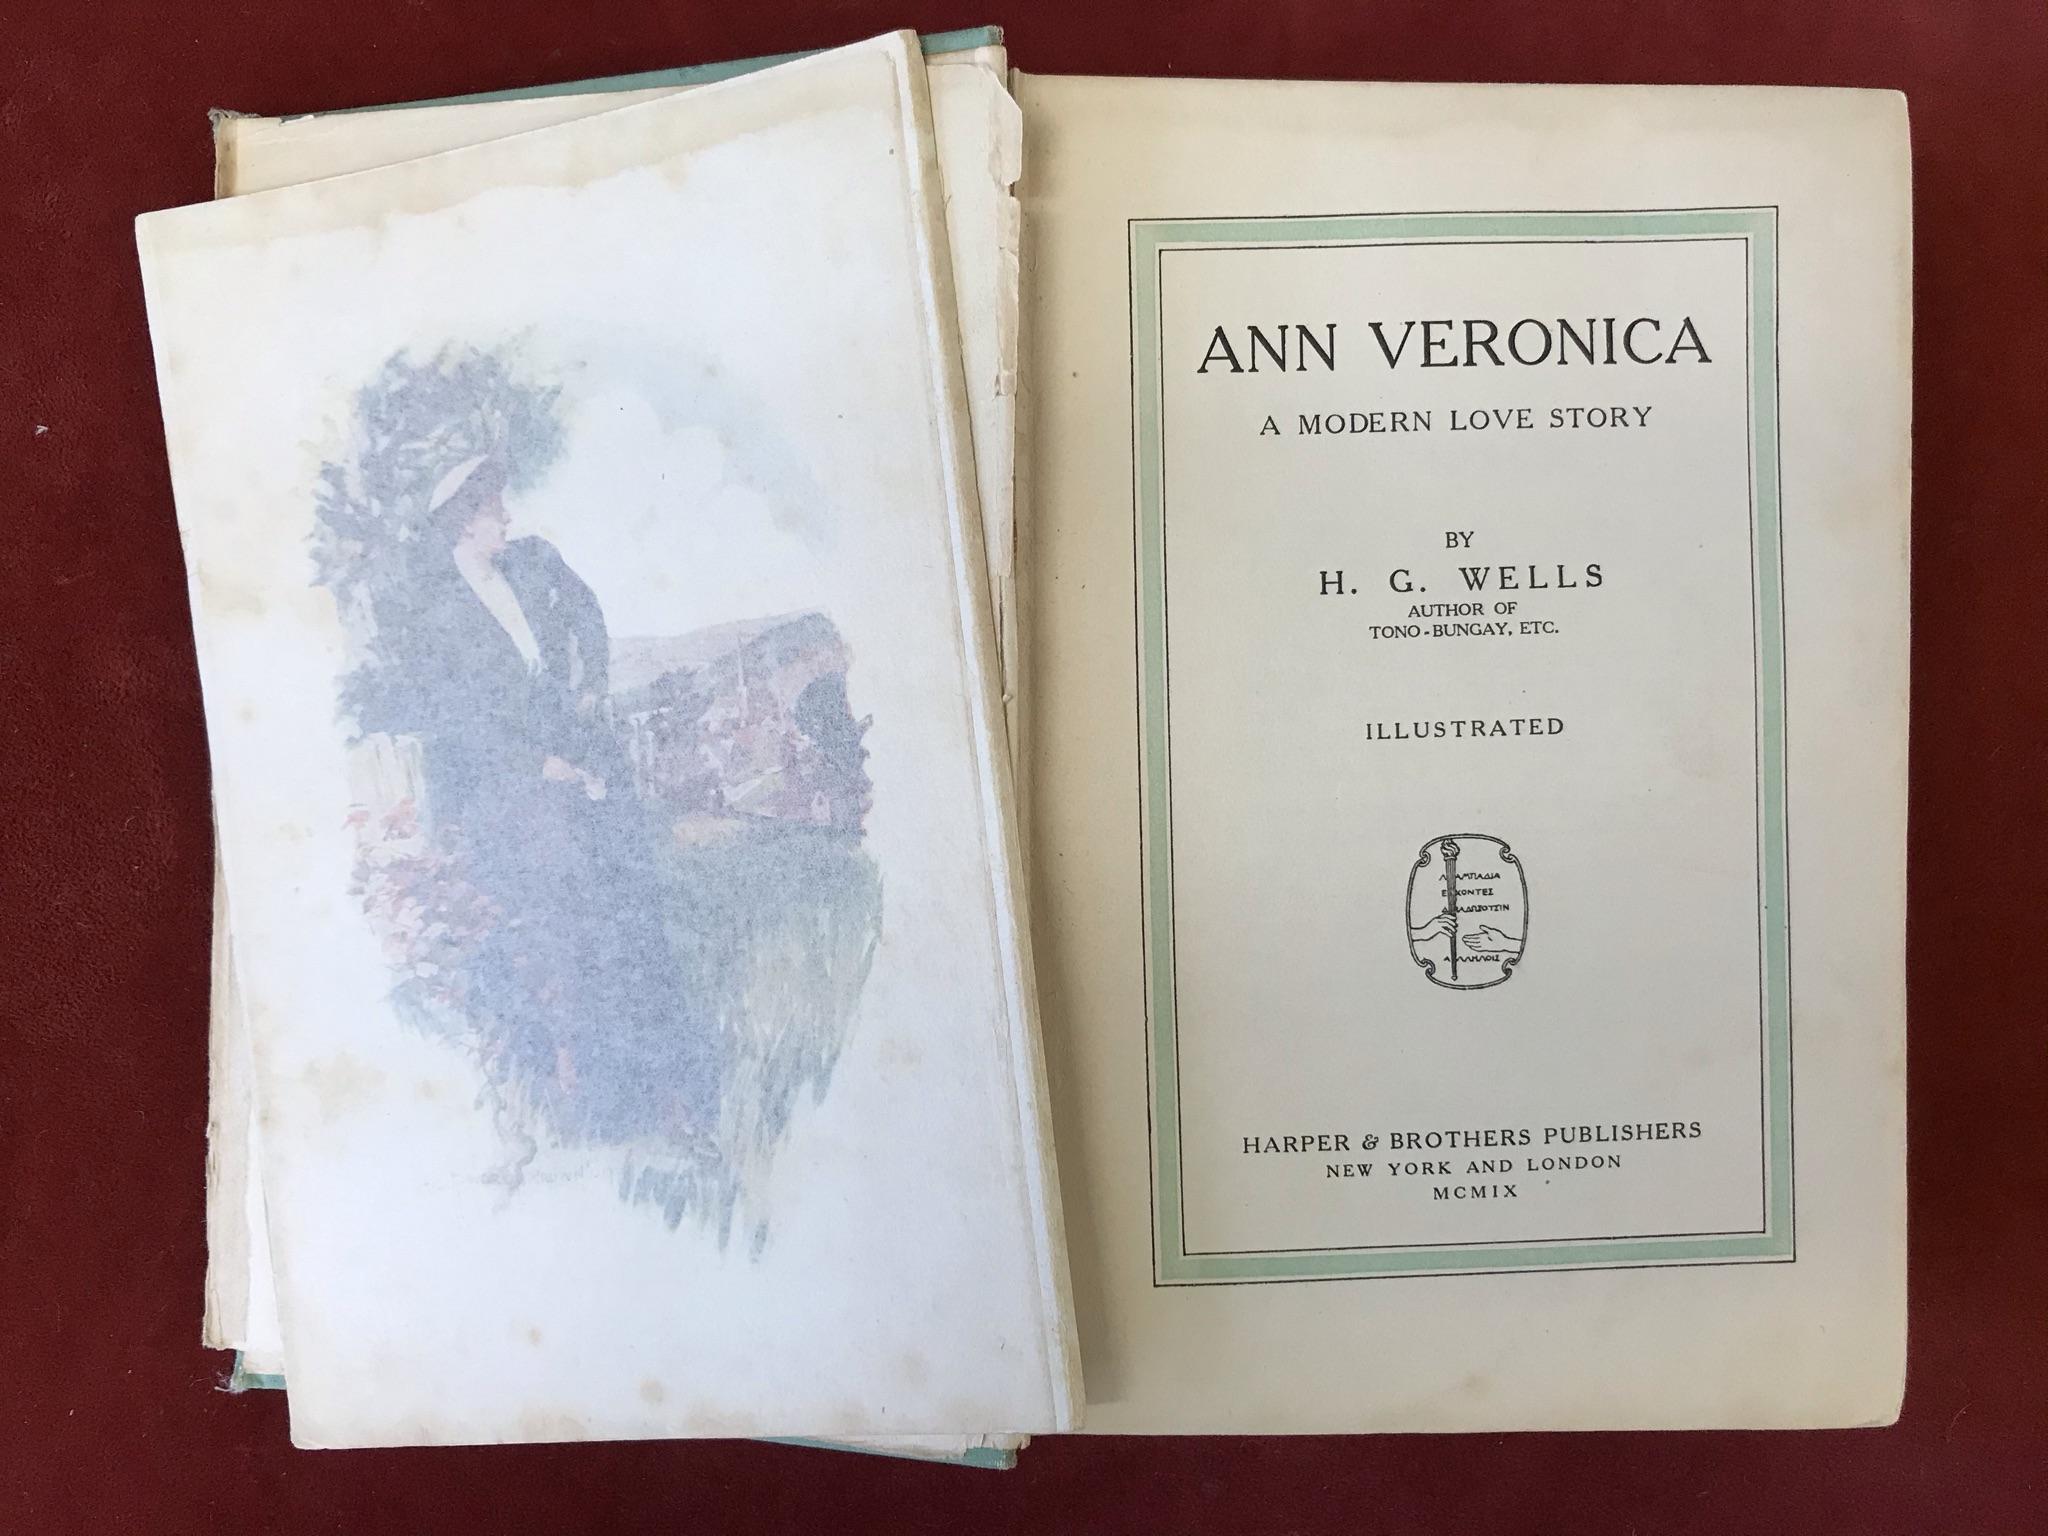 Ann VeronicaFirst U.S. edition, 1909 - Image 3 of 3